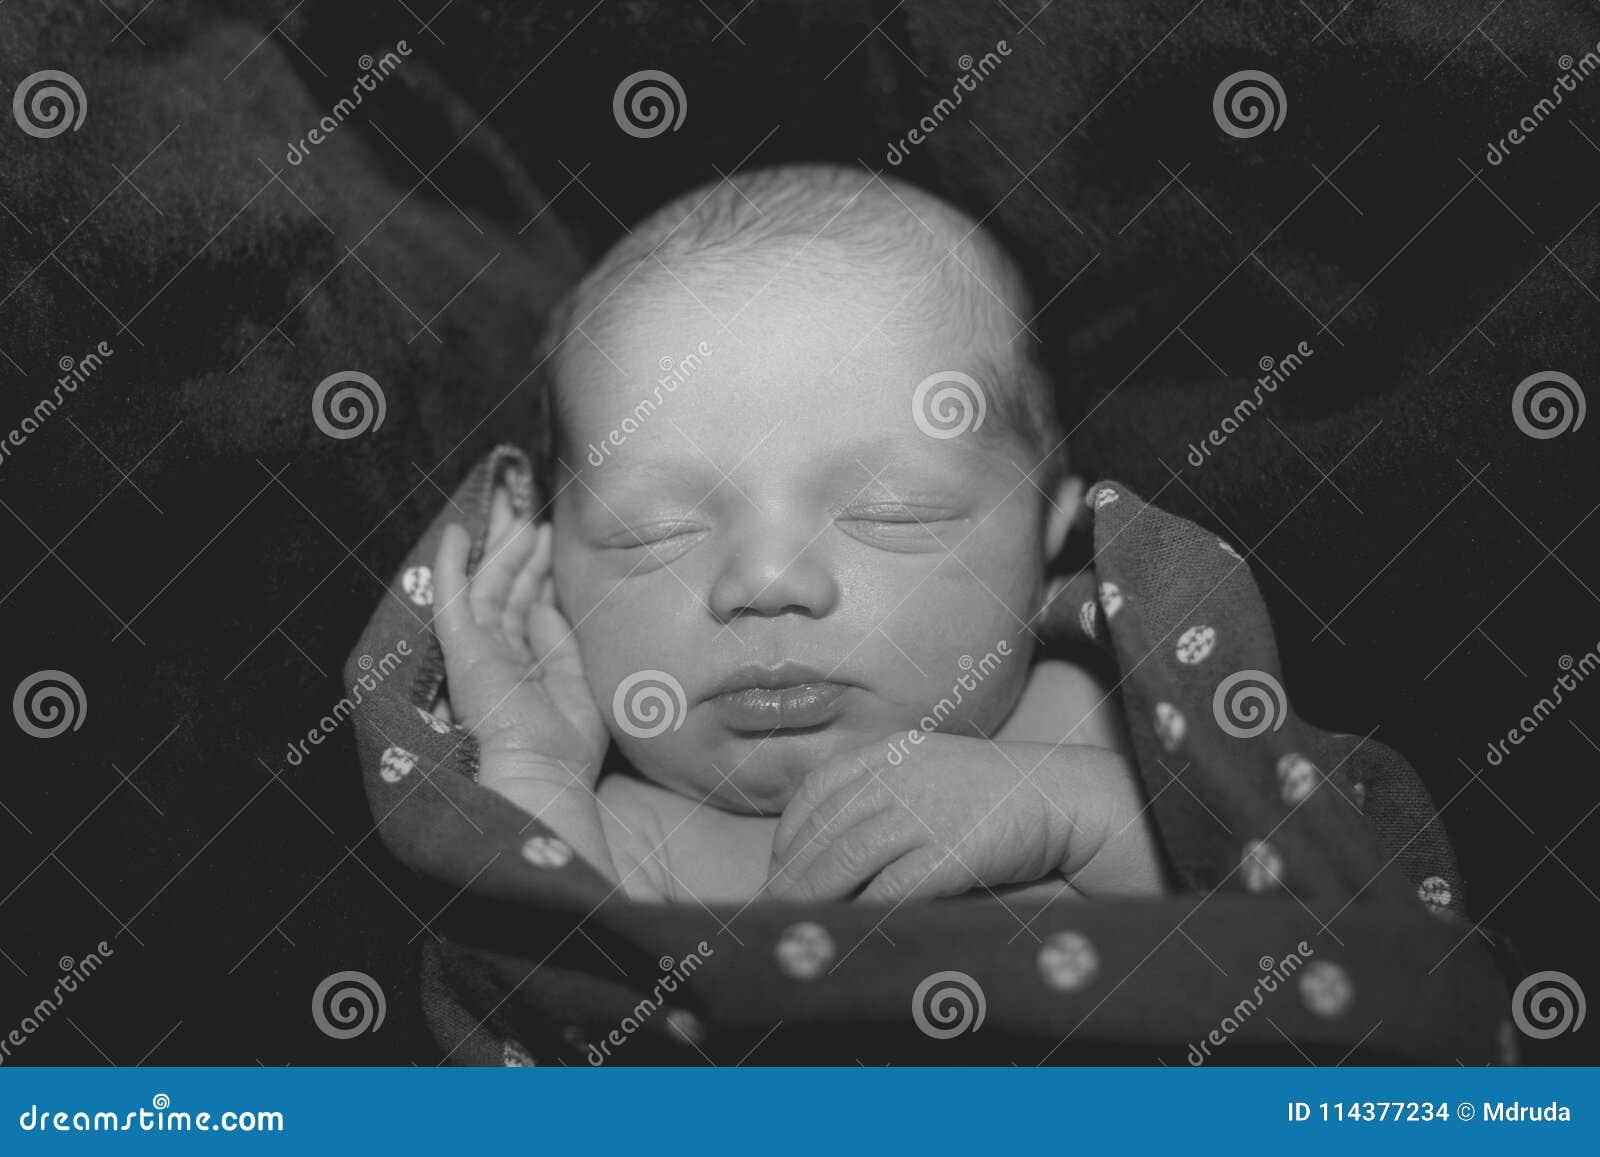 Newborn Baby Boy Stock Photo Image Of Hand Peaceful 114377234